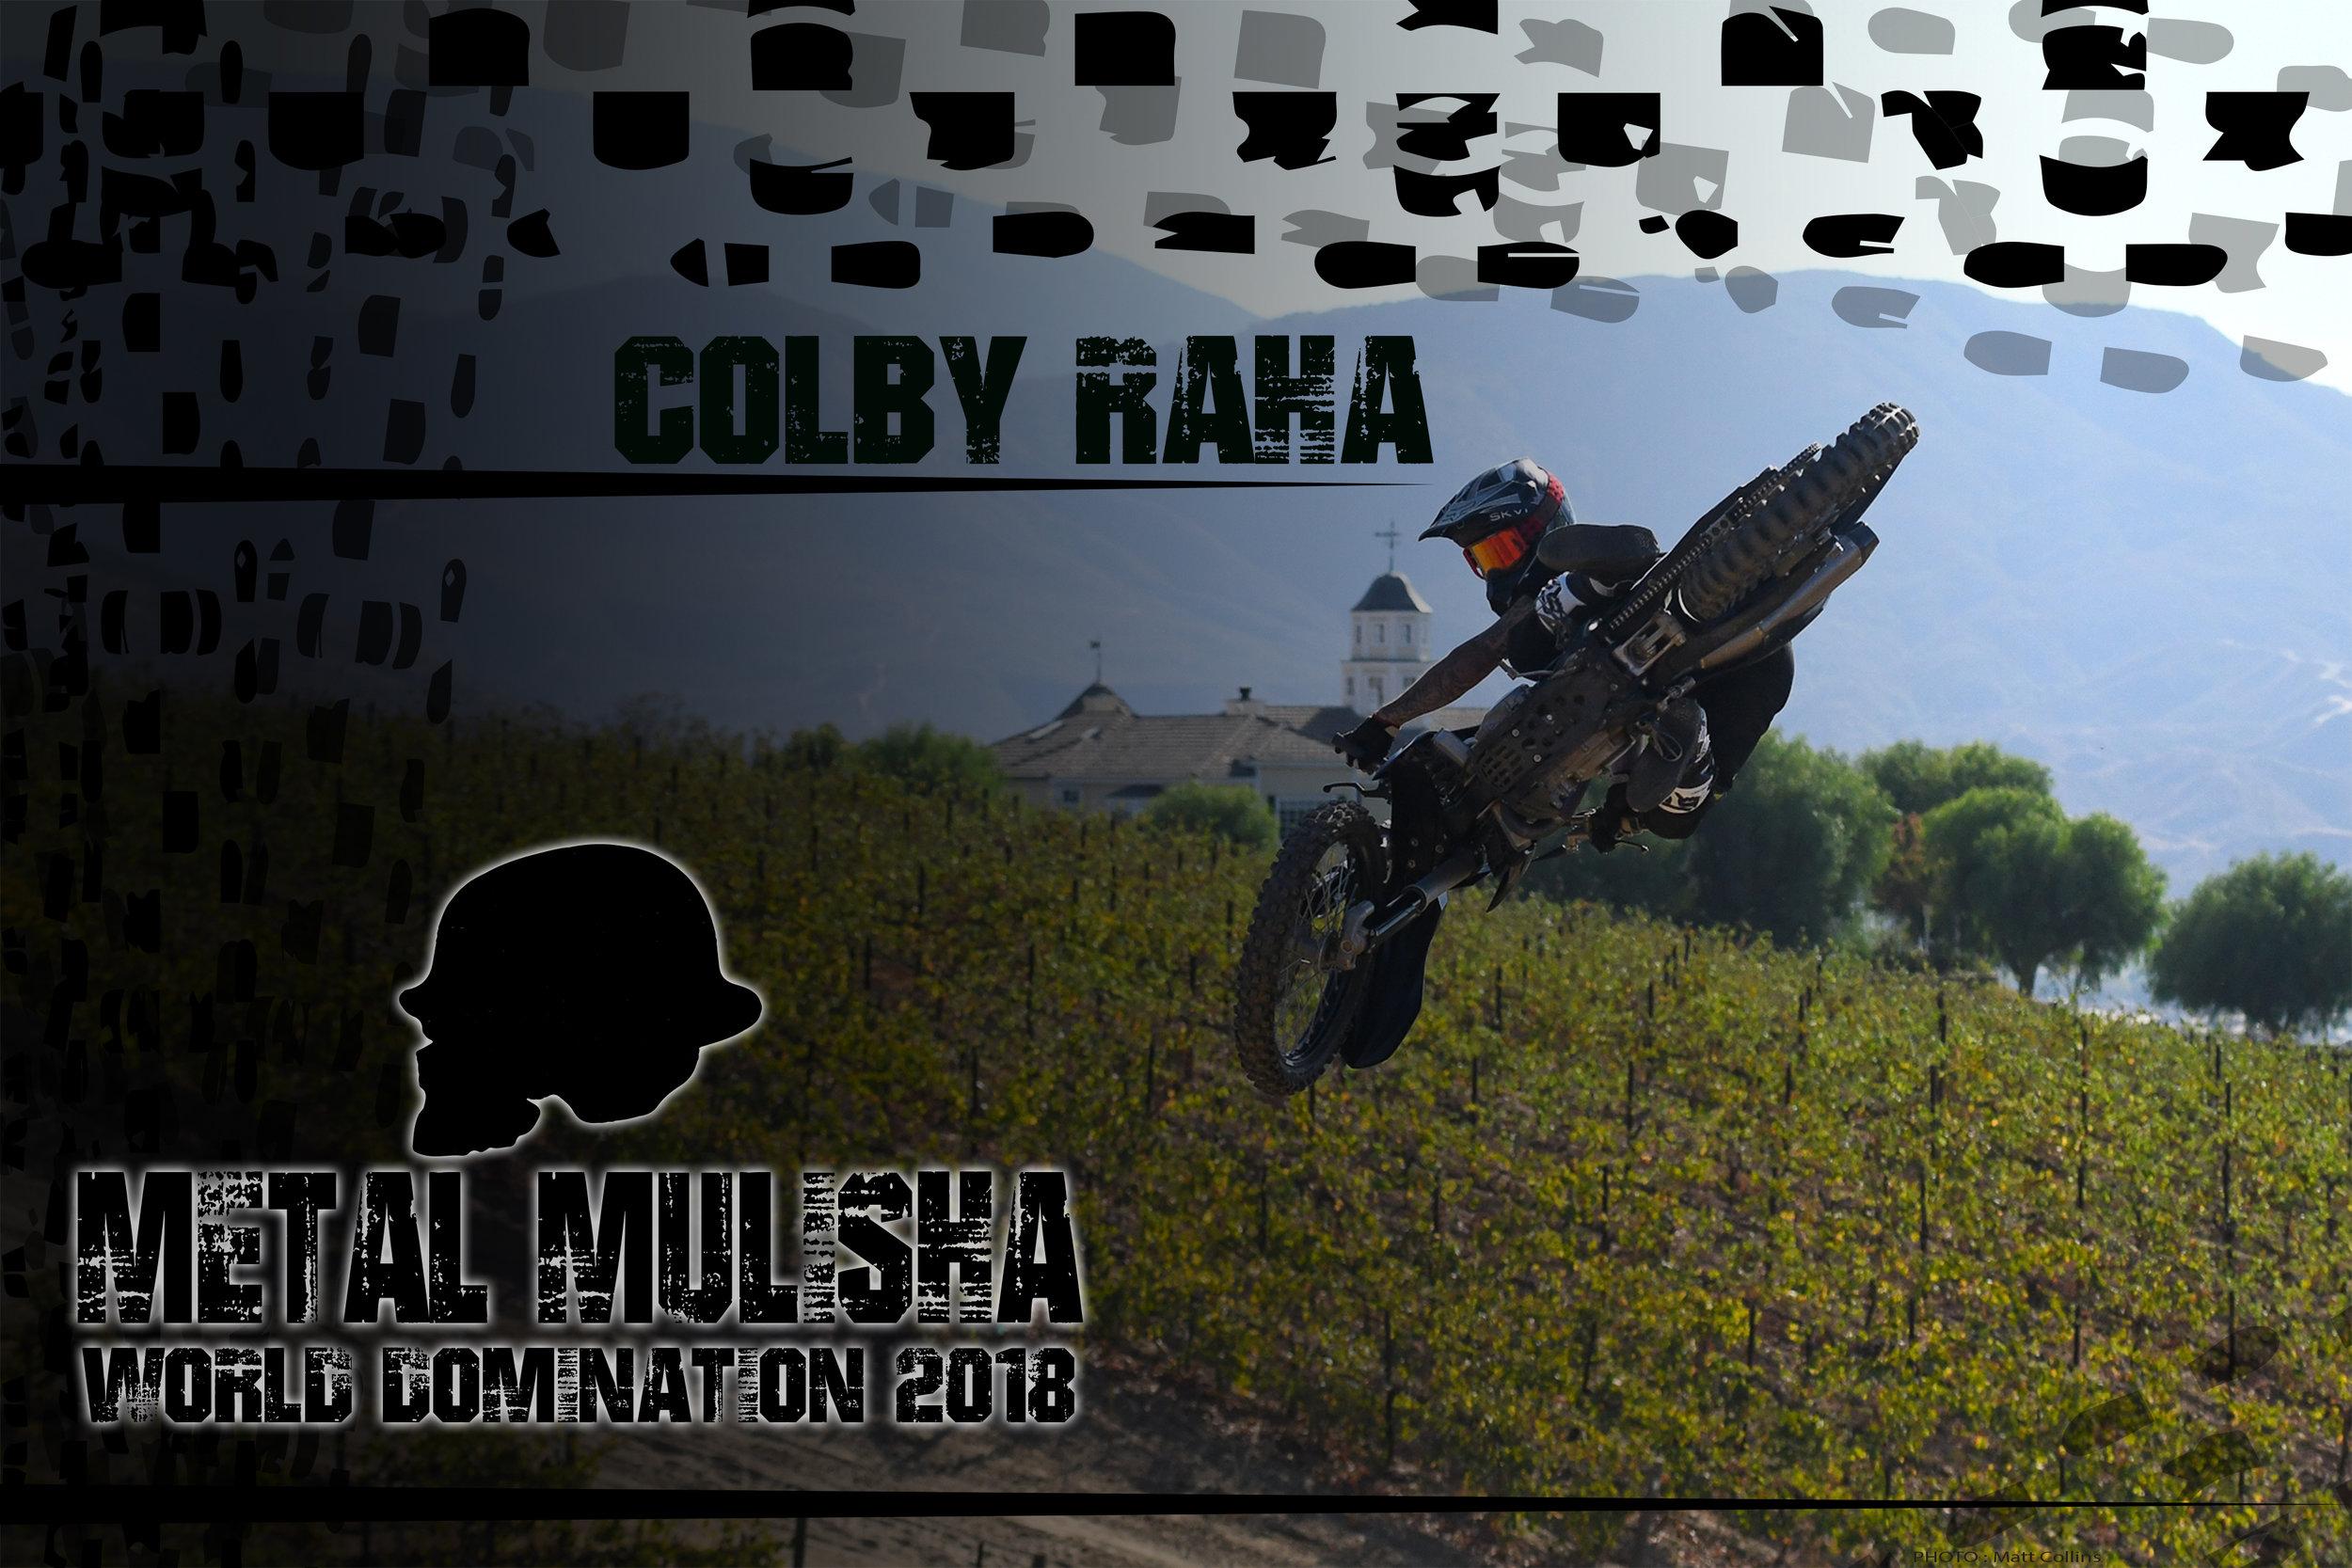 colby poster1.jpg